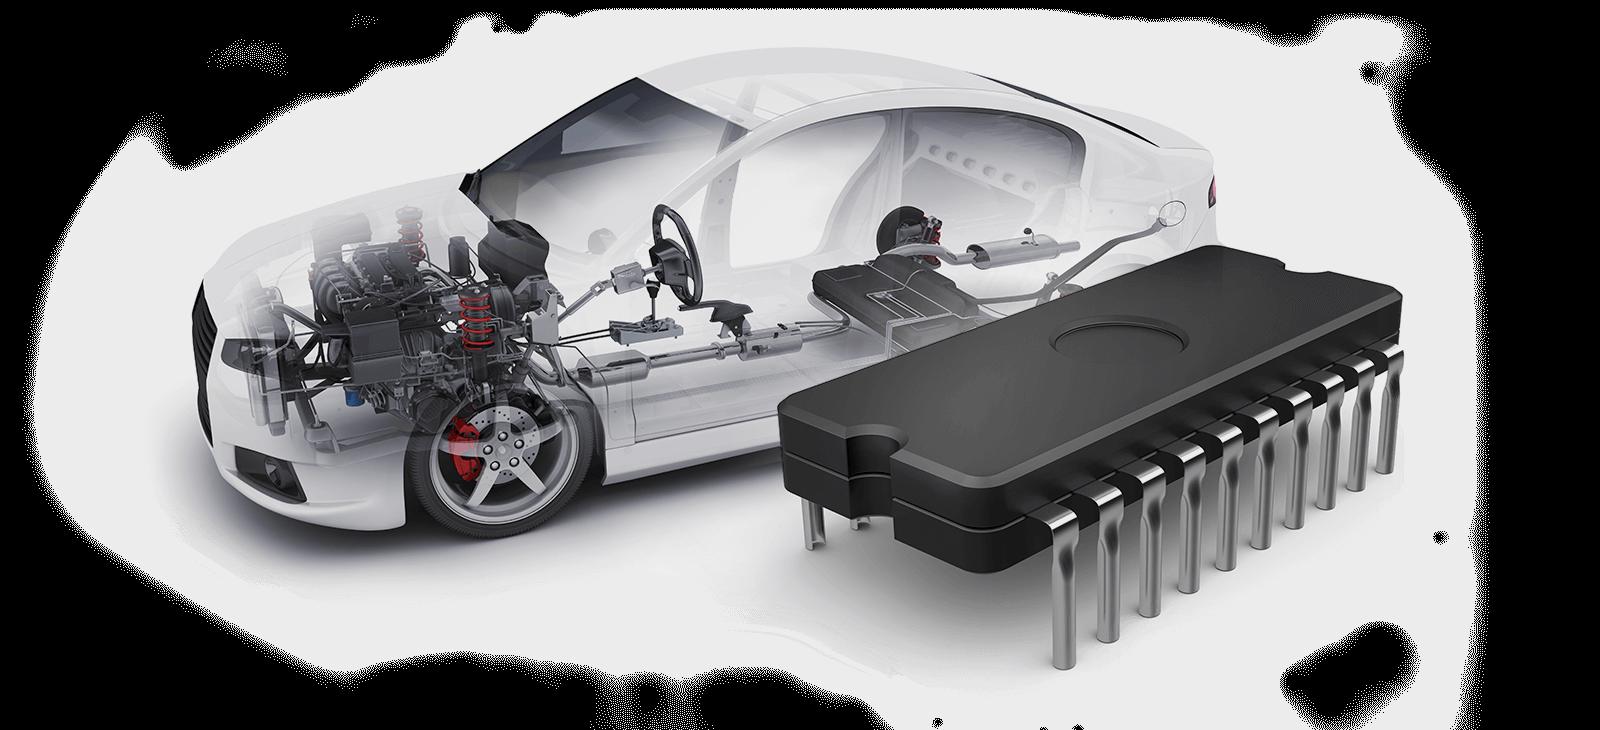 future automotive systems